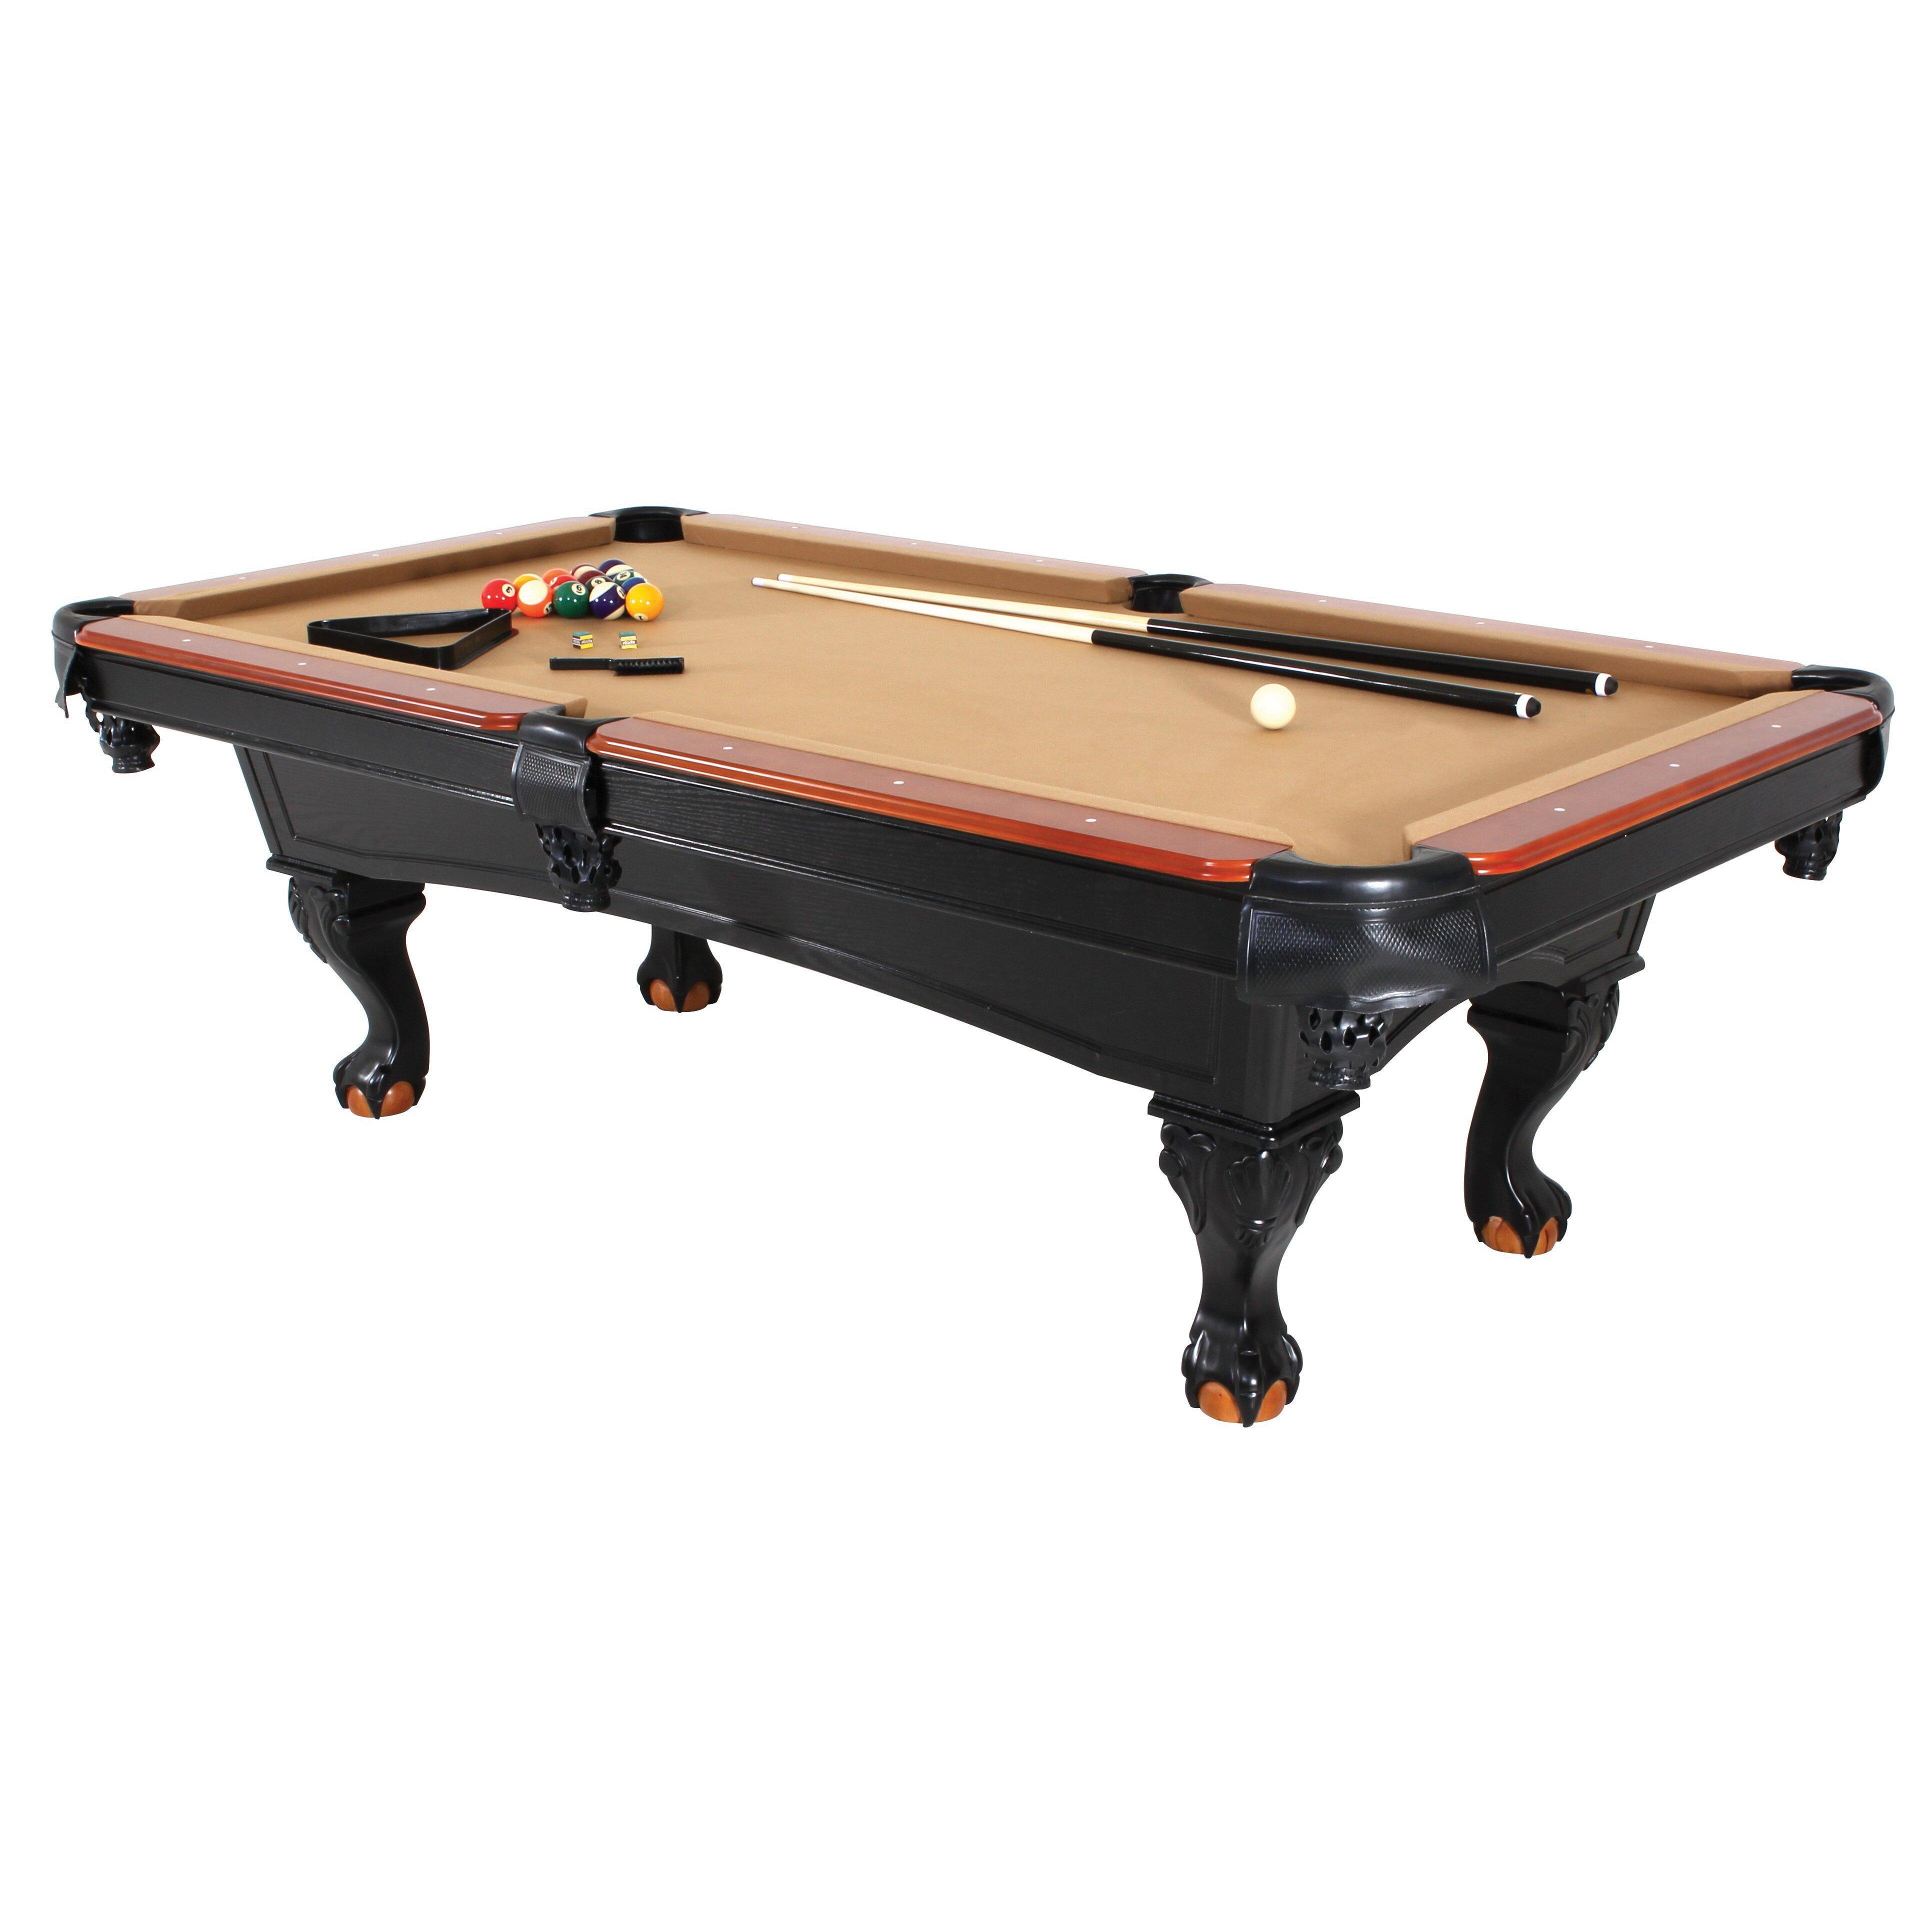 Minnesota Fats Pool Tables Escalade Sports Minnesota Fats Covington™ 7.5' Pool Table & Reviews ...